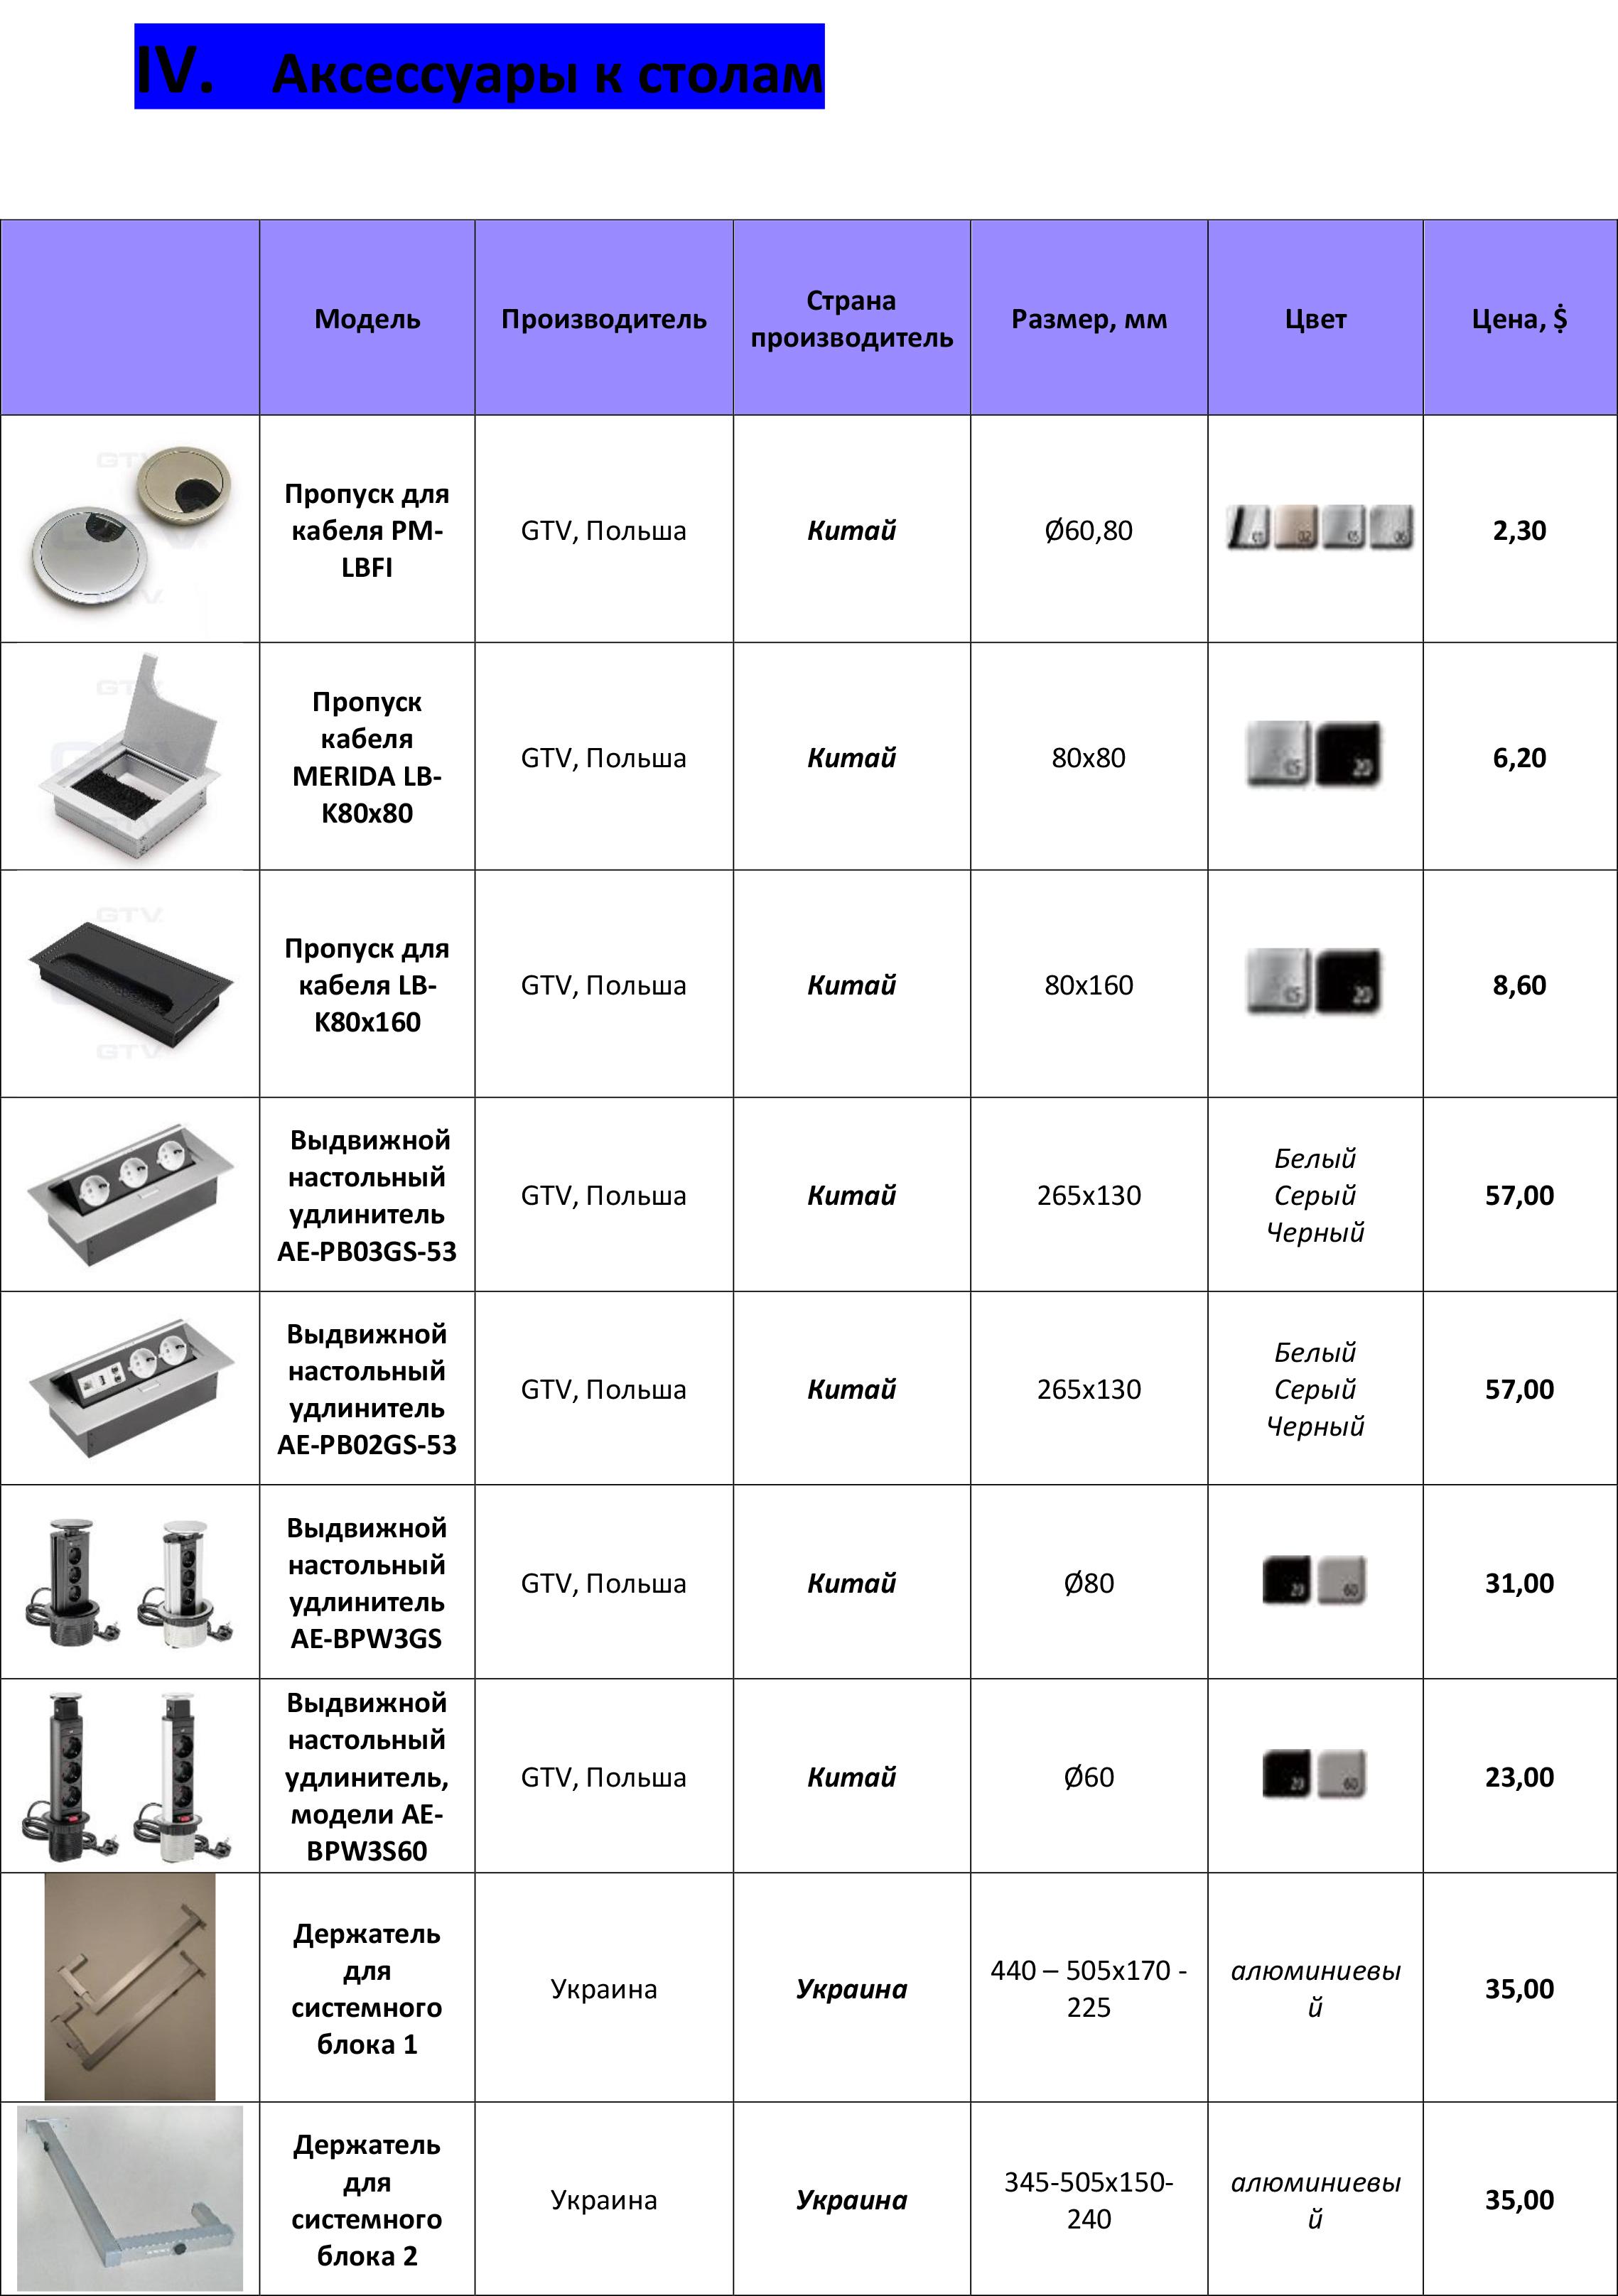 10_accessories_conset.jpg